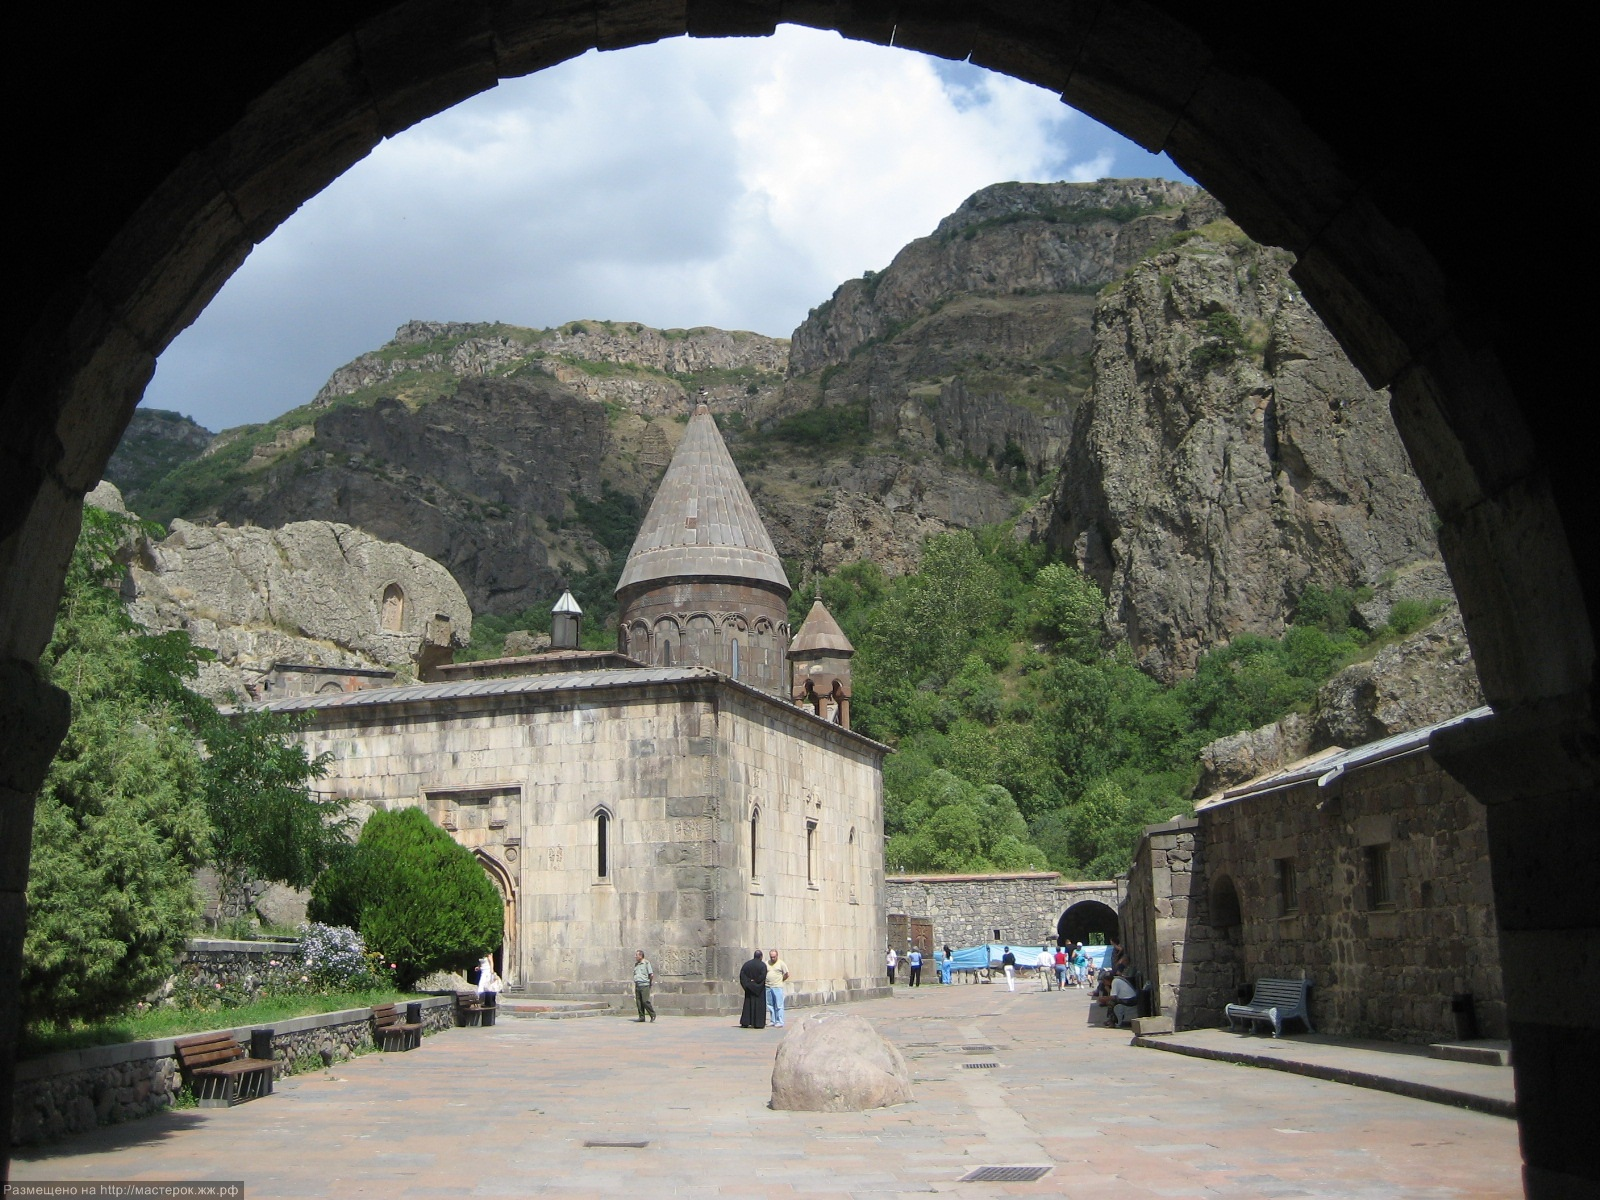 Entrance to Geghard Monastery (UNESCO World Heritage Site)